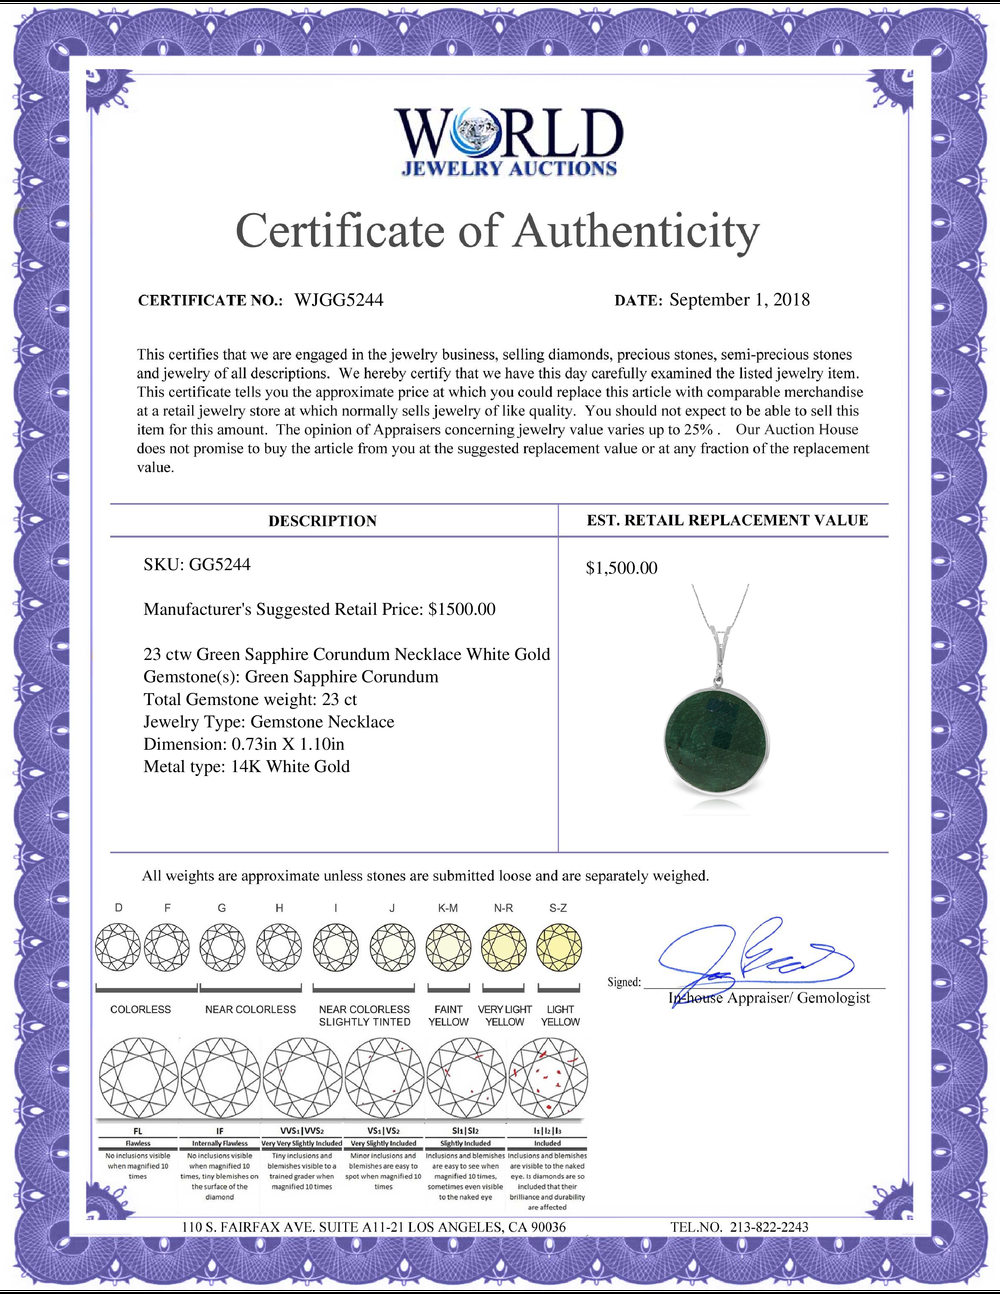 Lot 3187: Genuine 23 ctw Green Sapphire Corundum Necklace Jewelry 14KT White Gold - REF-48K3V